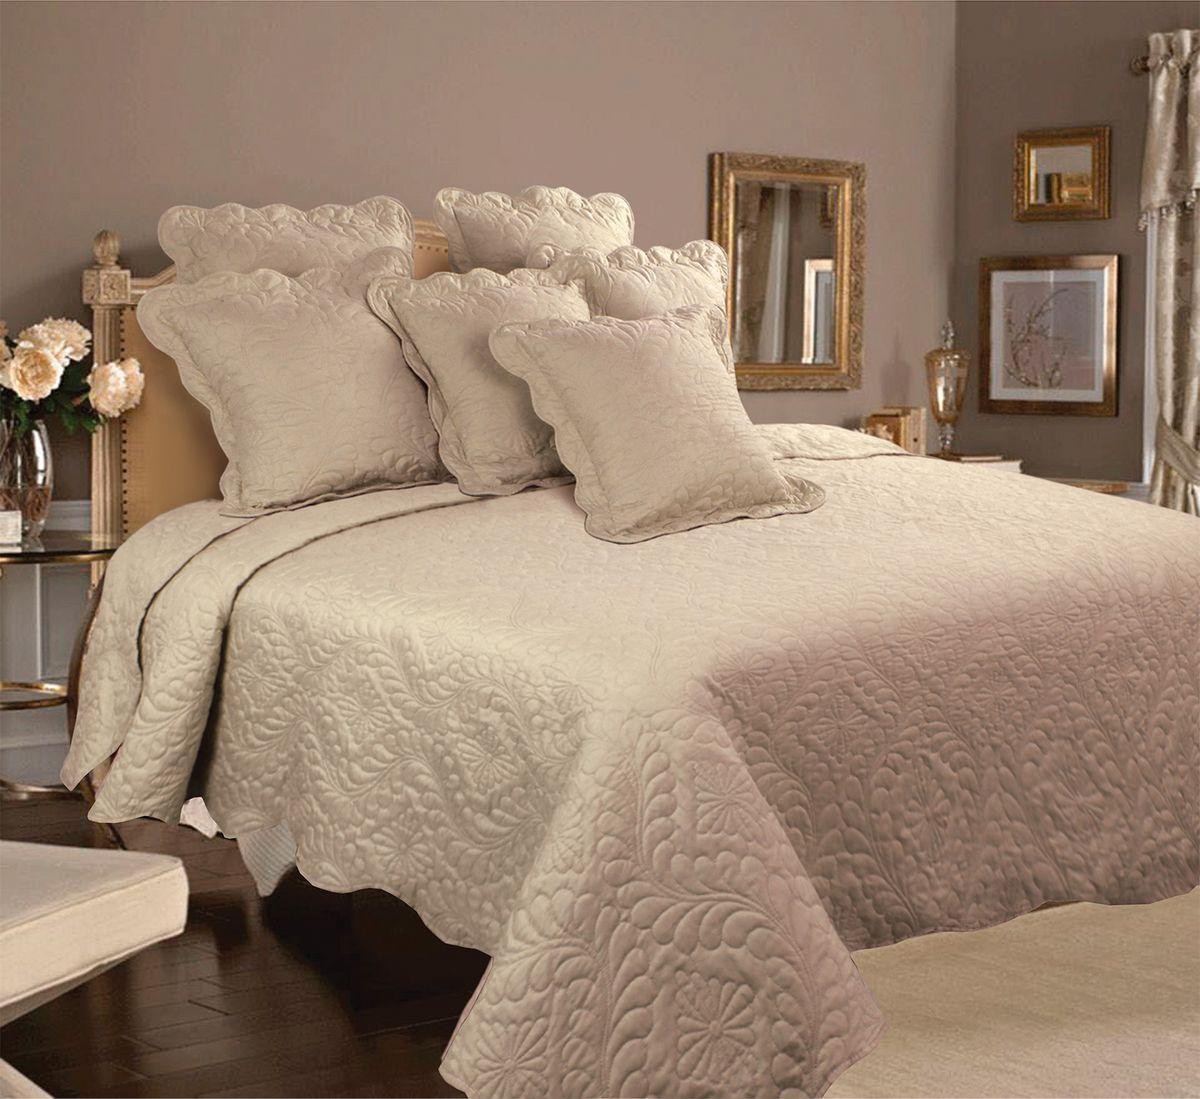 Комплект для спальни Mona Liza Royal Latte: покрывало 200 х 220 см, 2 наволочки 40 х 40 см, цвет: латте